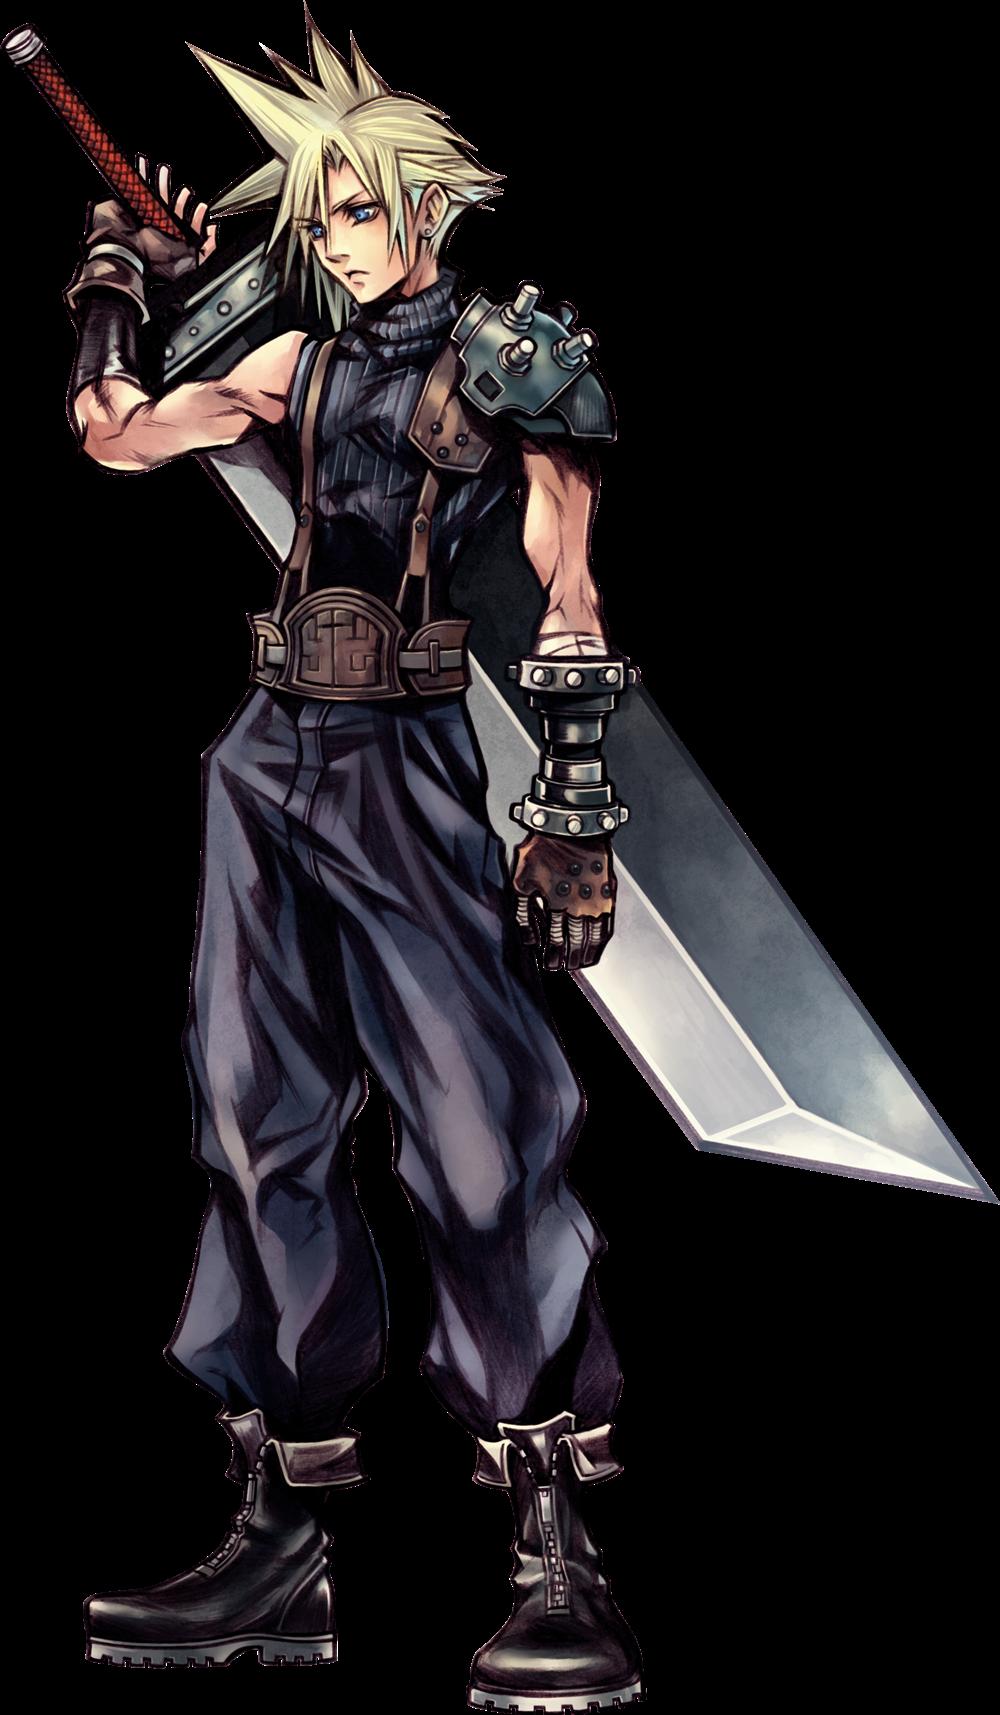 Dissidia Final Fantasy Art By Tetsuya Nomura Based On Yoshitaka Amano Character Designs For Fina Final Fantasy Characters Final Fantasy Vii Cloud Final Fantasy